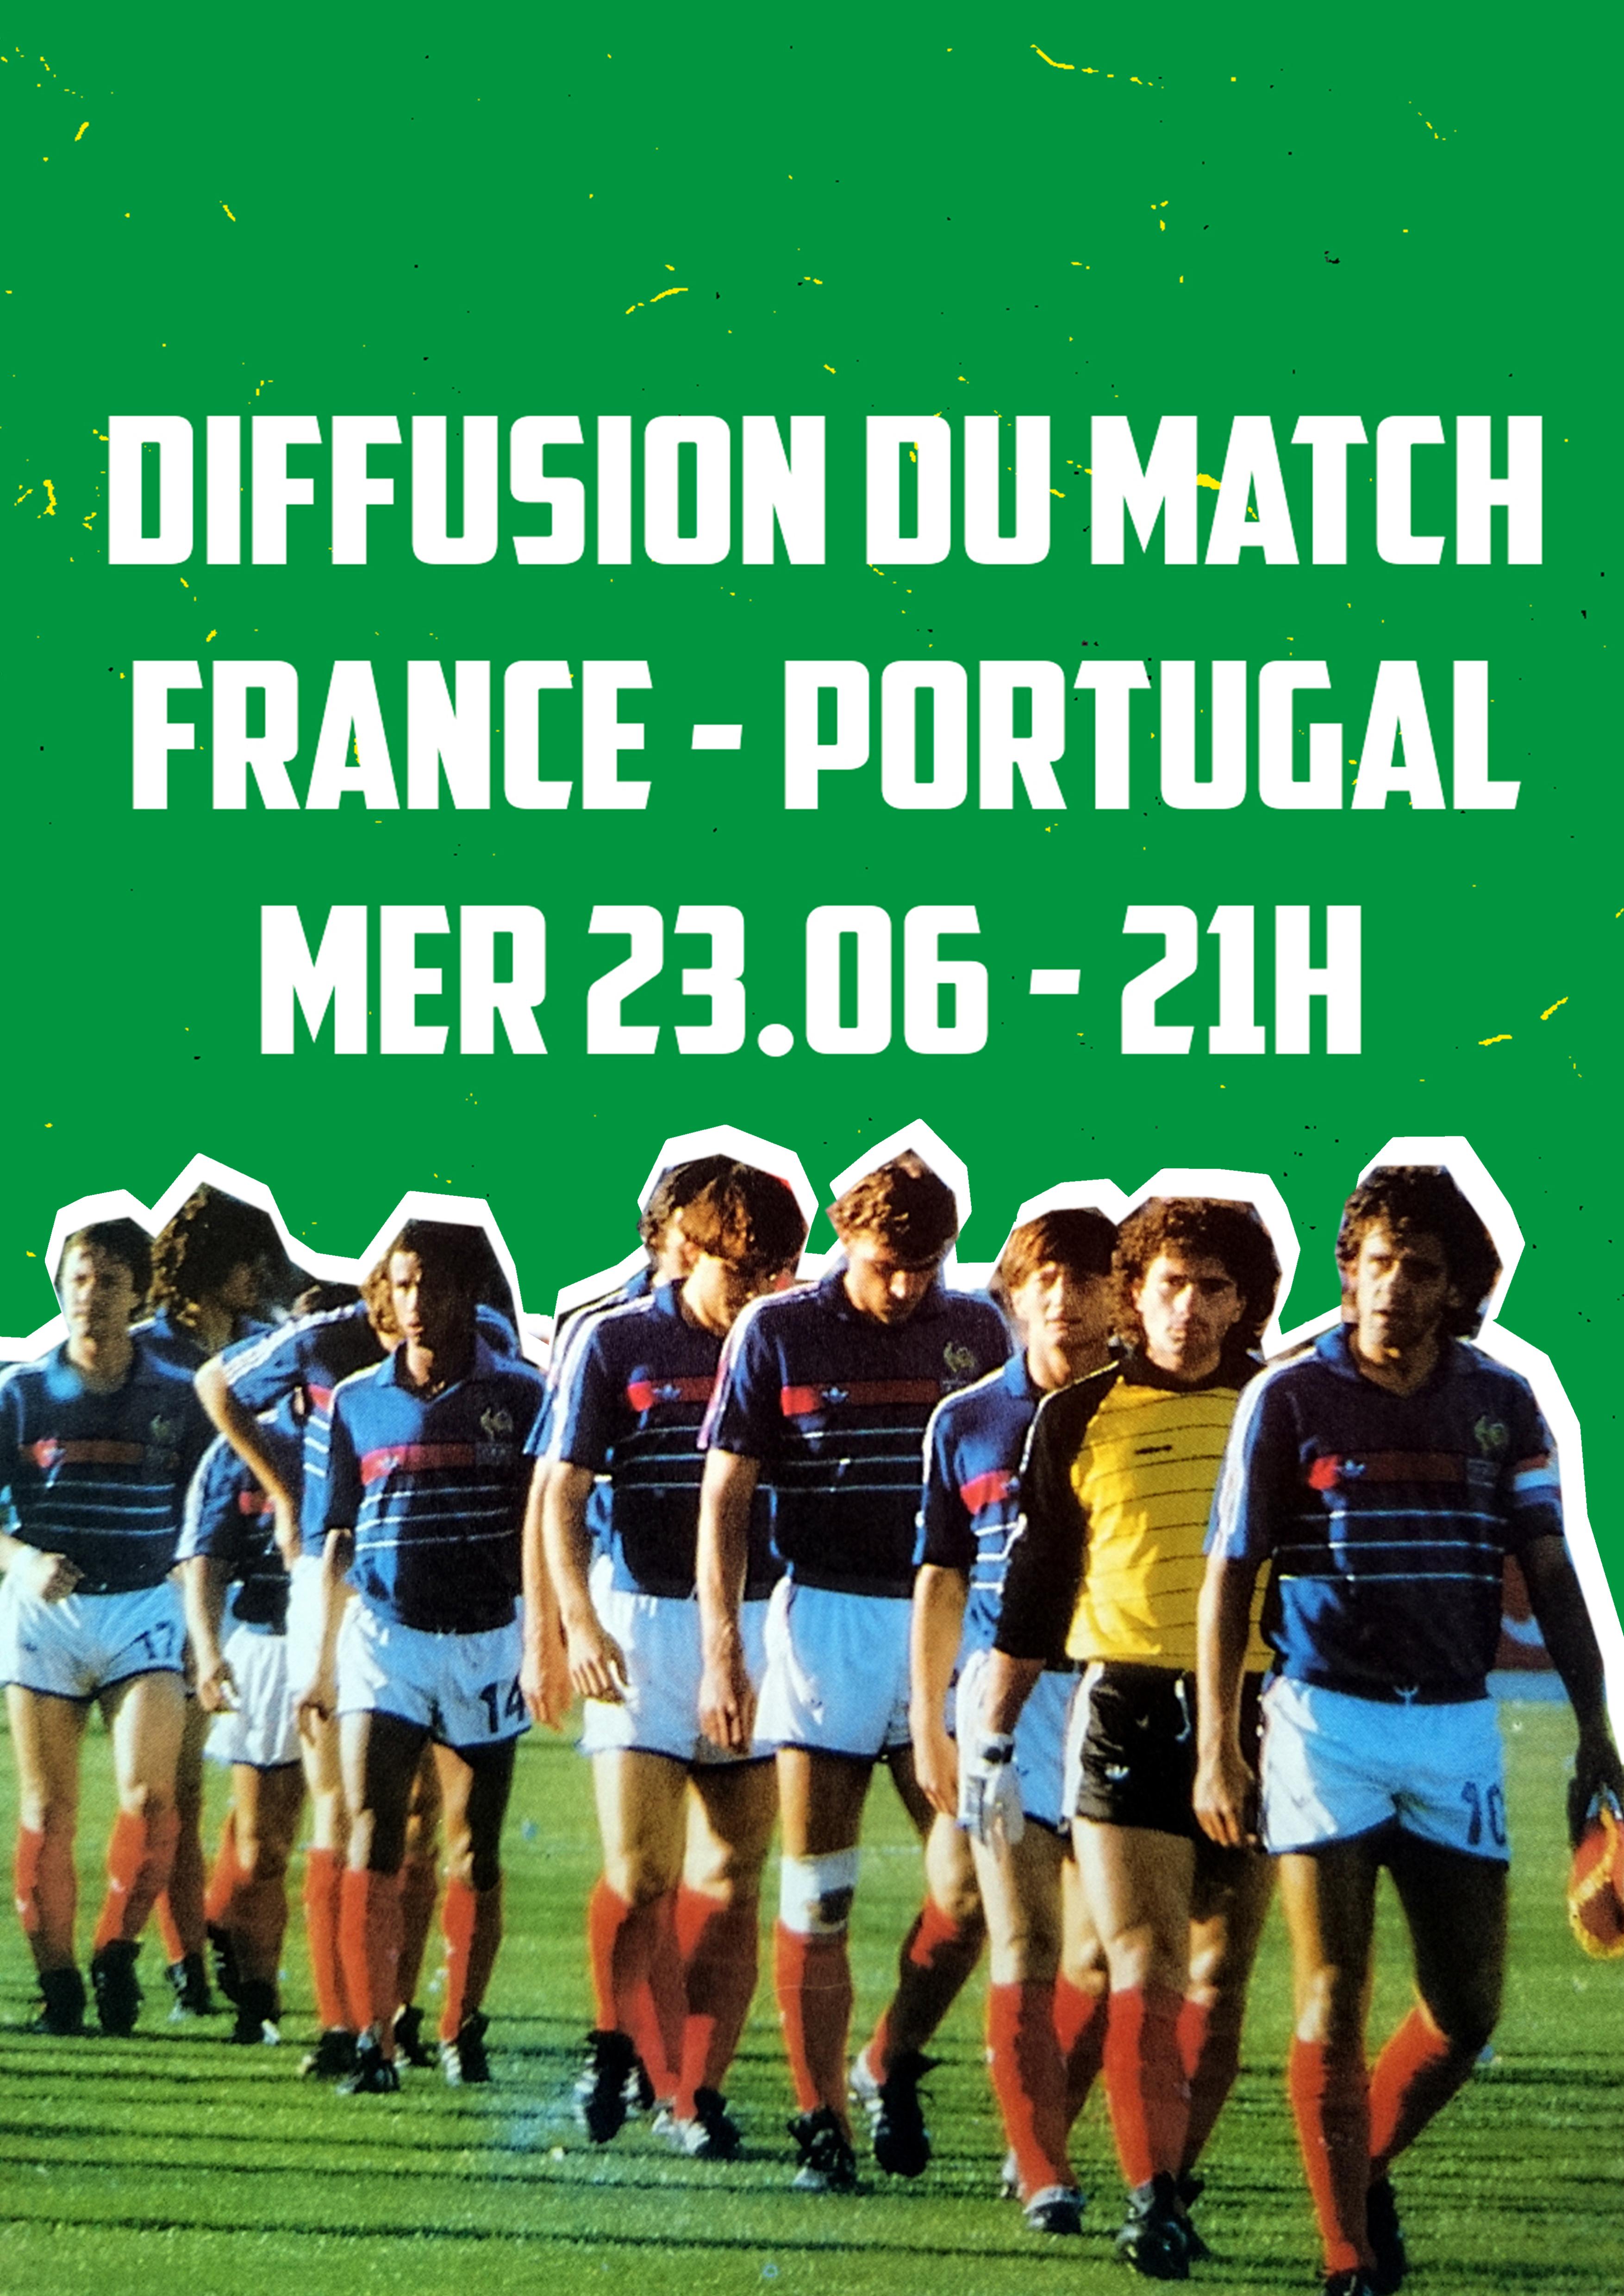 FRANCE - PORTUGAL // 23.06